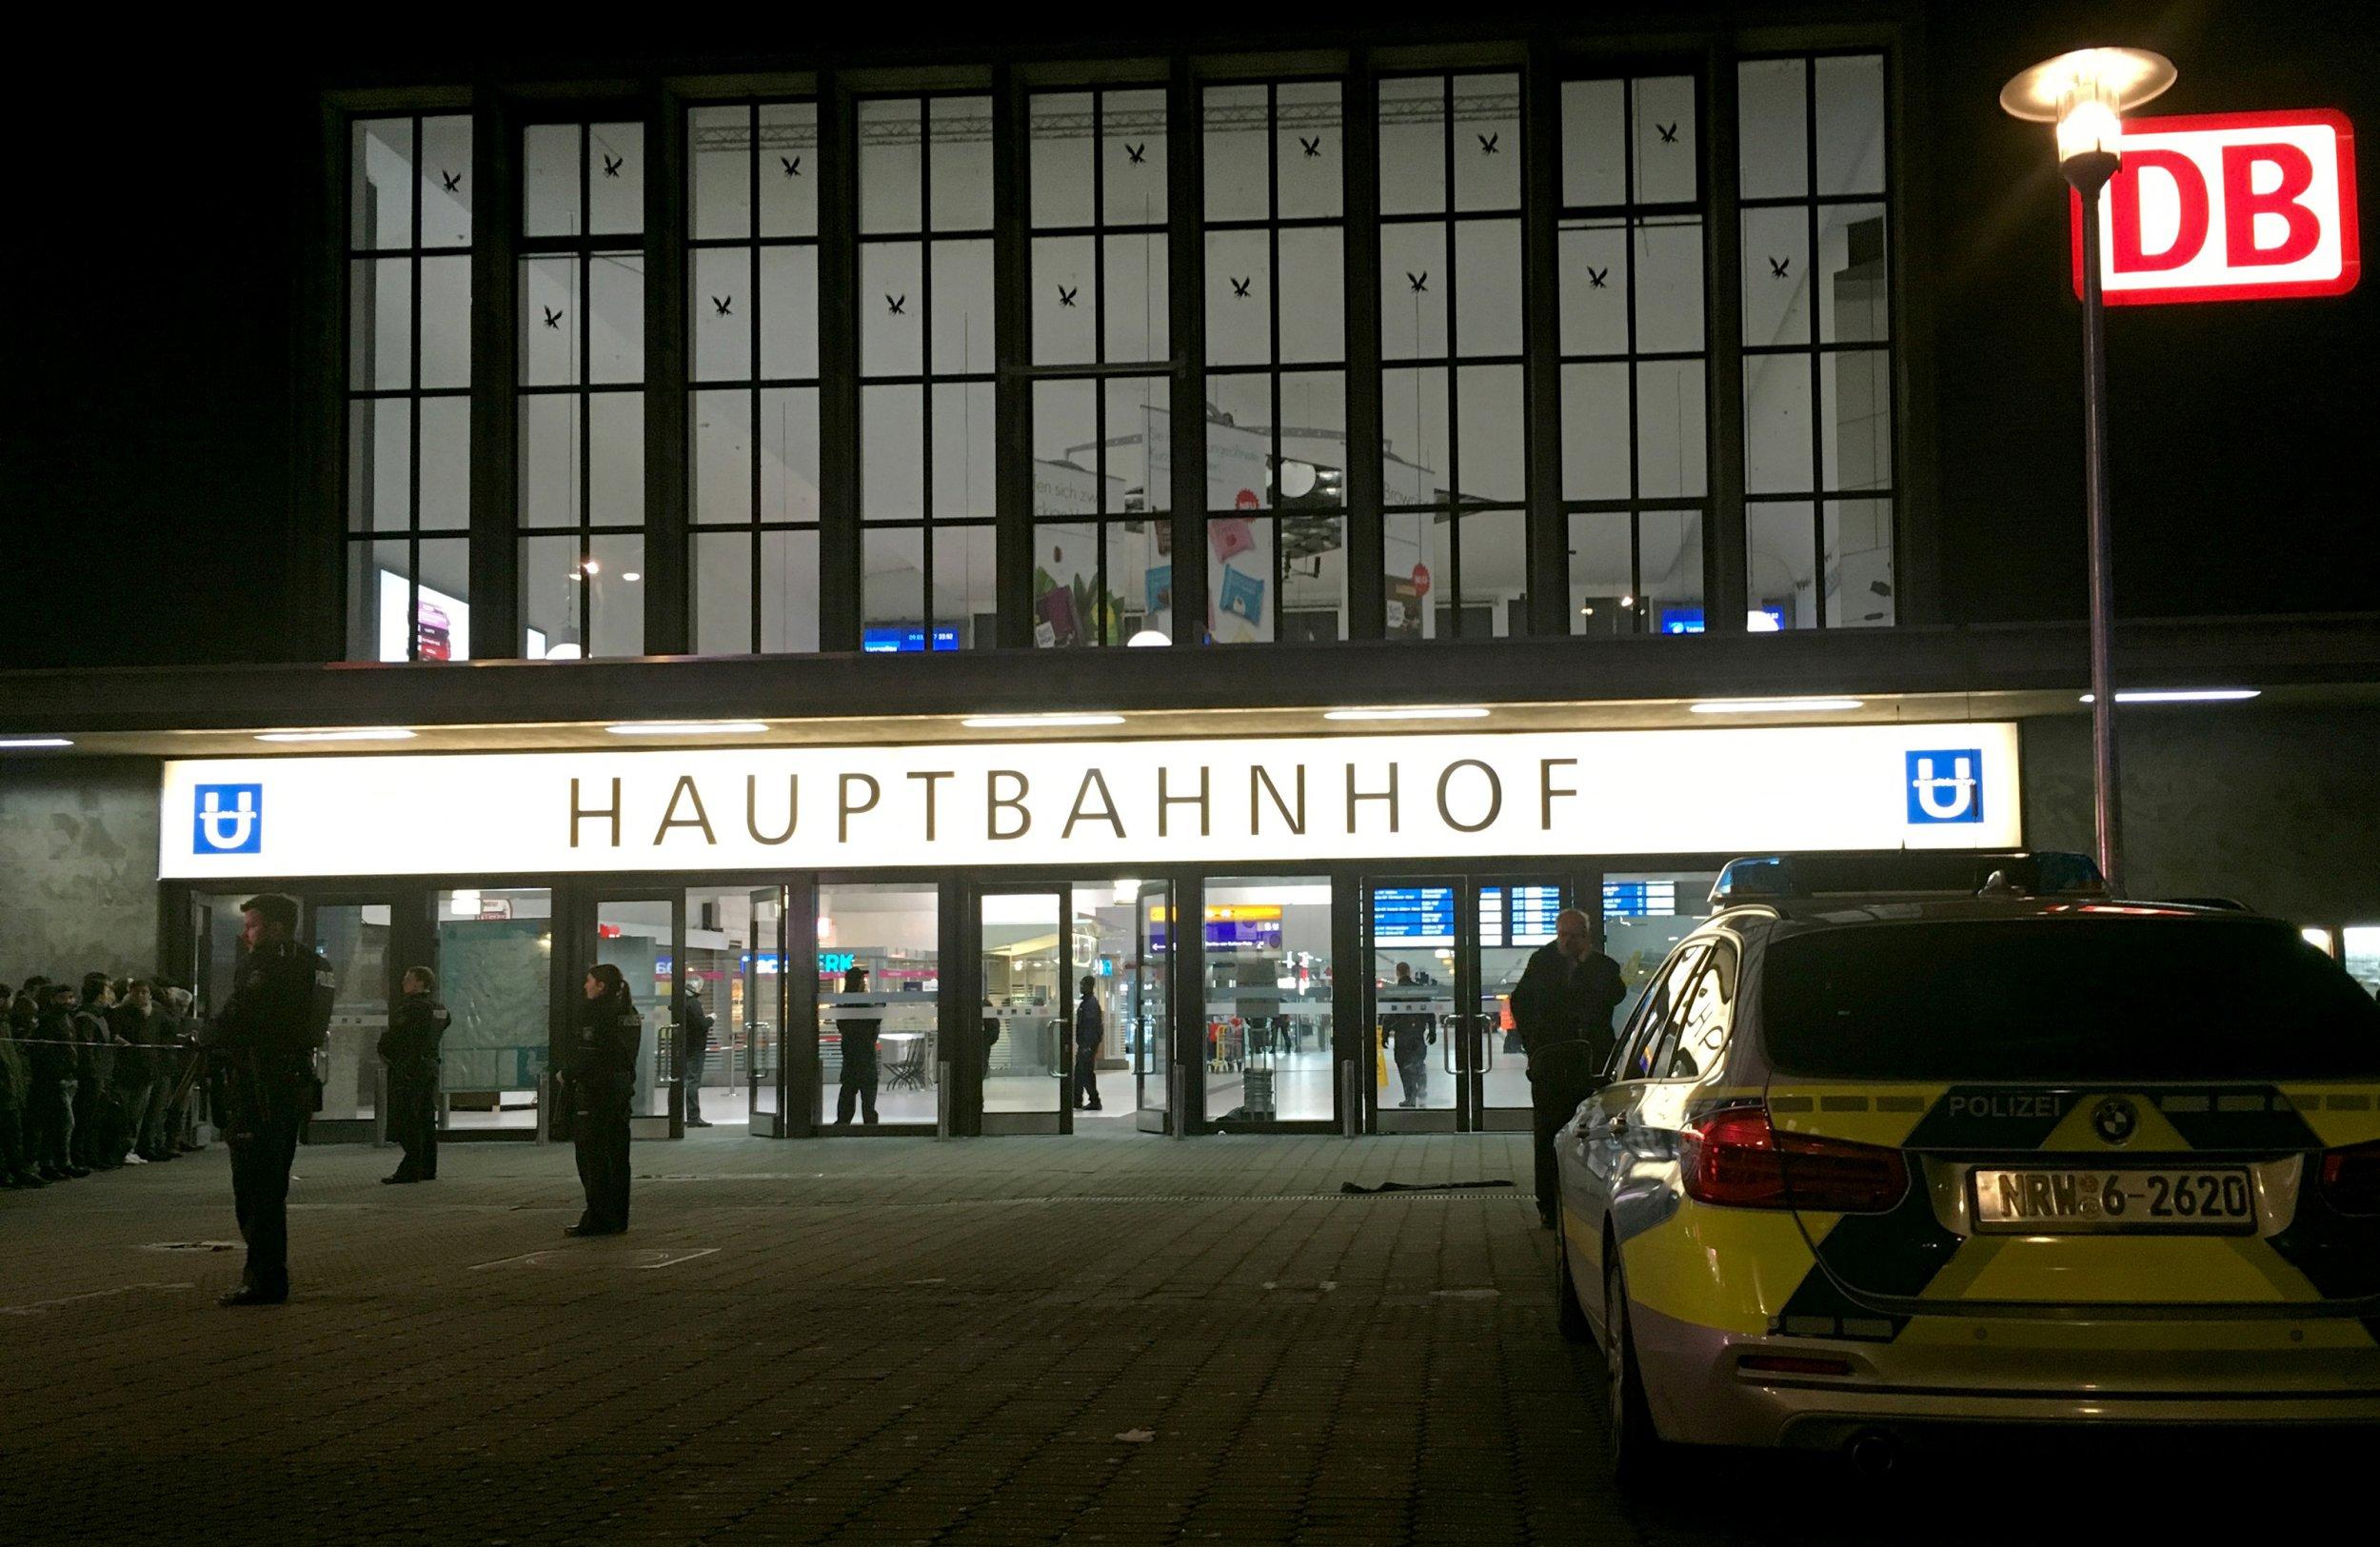 Dusseldorf station axe attack